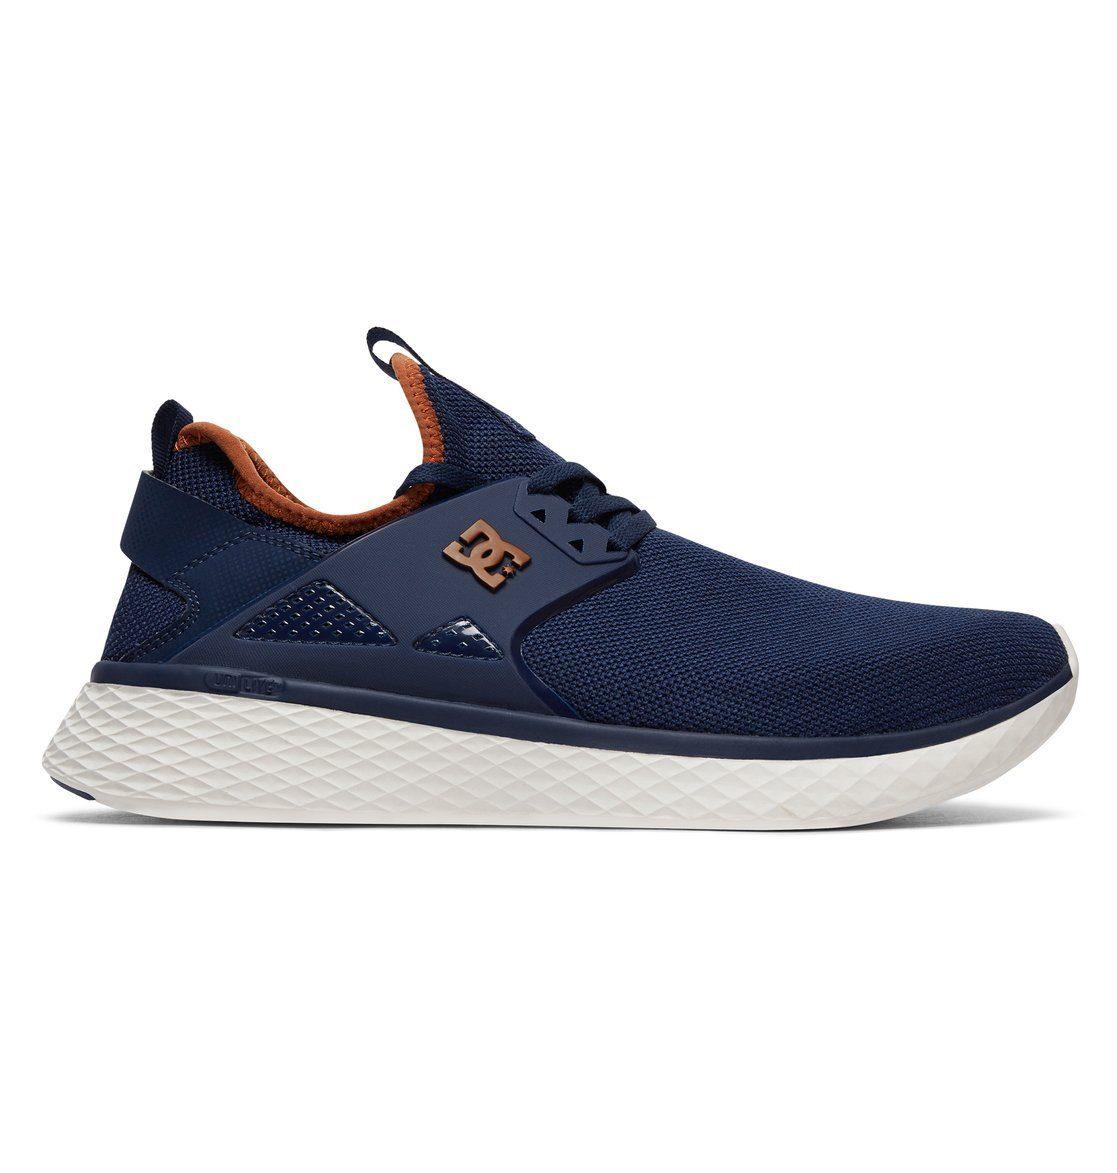 DC Shoes Schuhe Meridian online kaufen  Navy#ft5_slash#camel